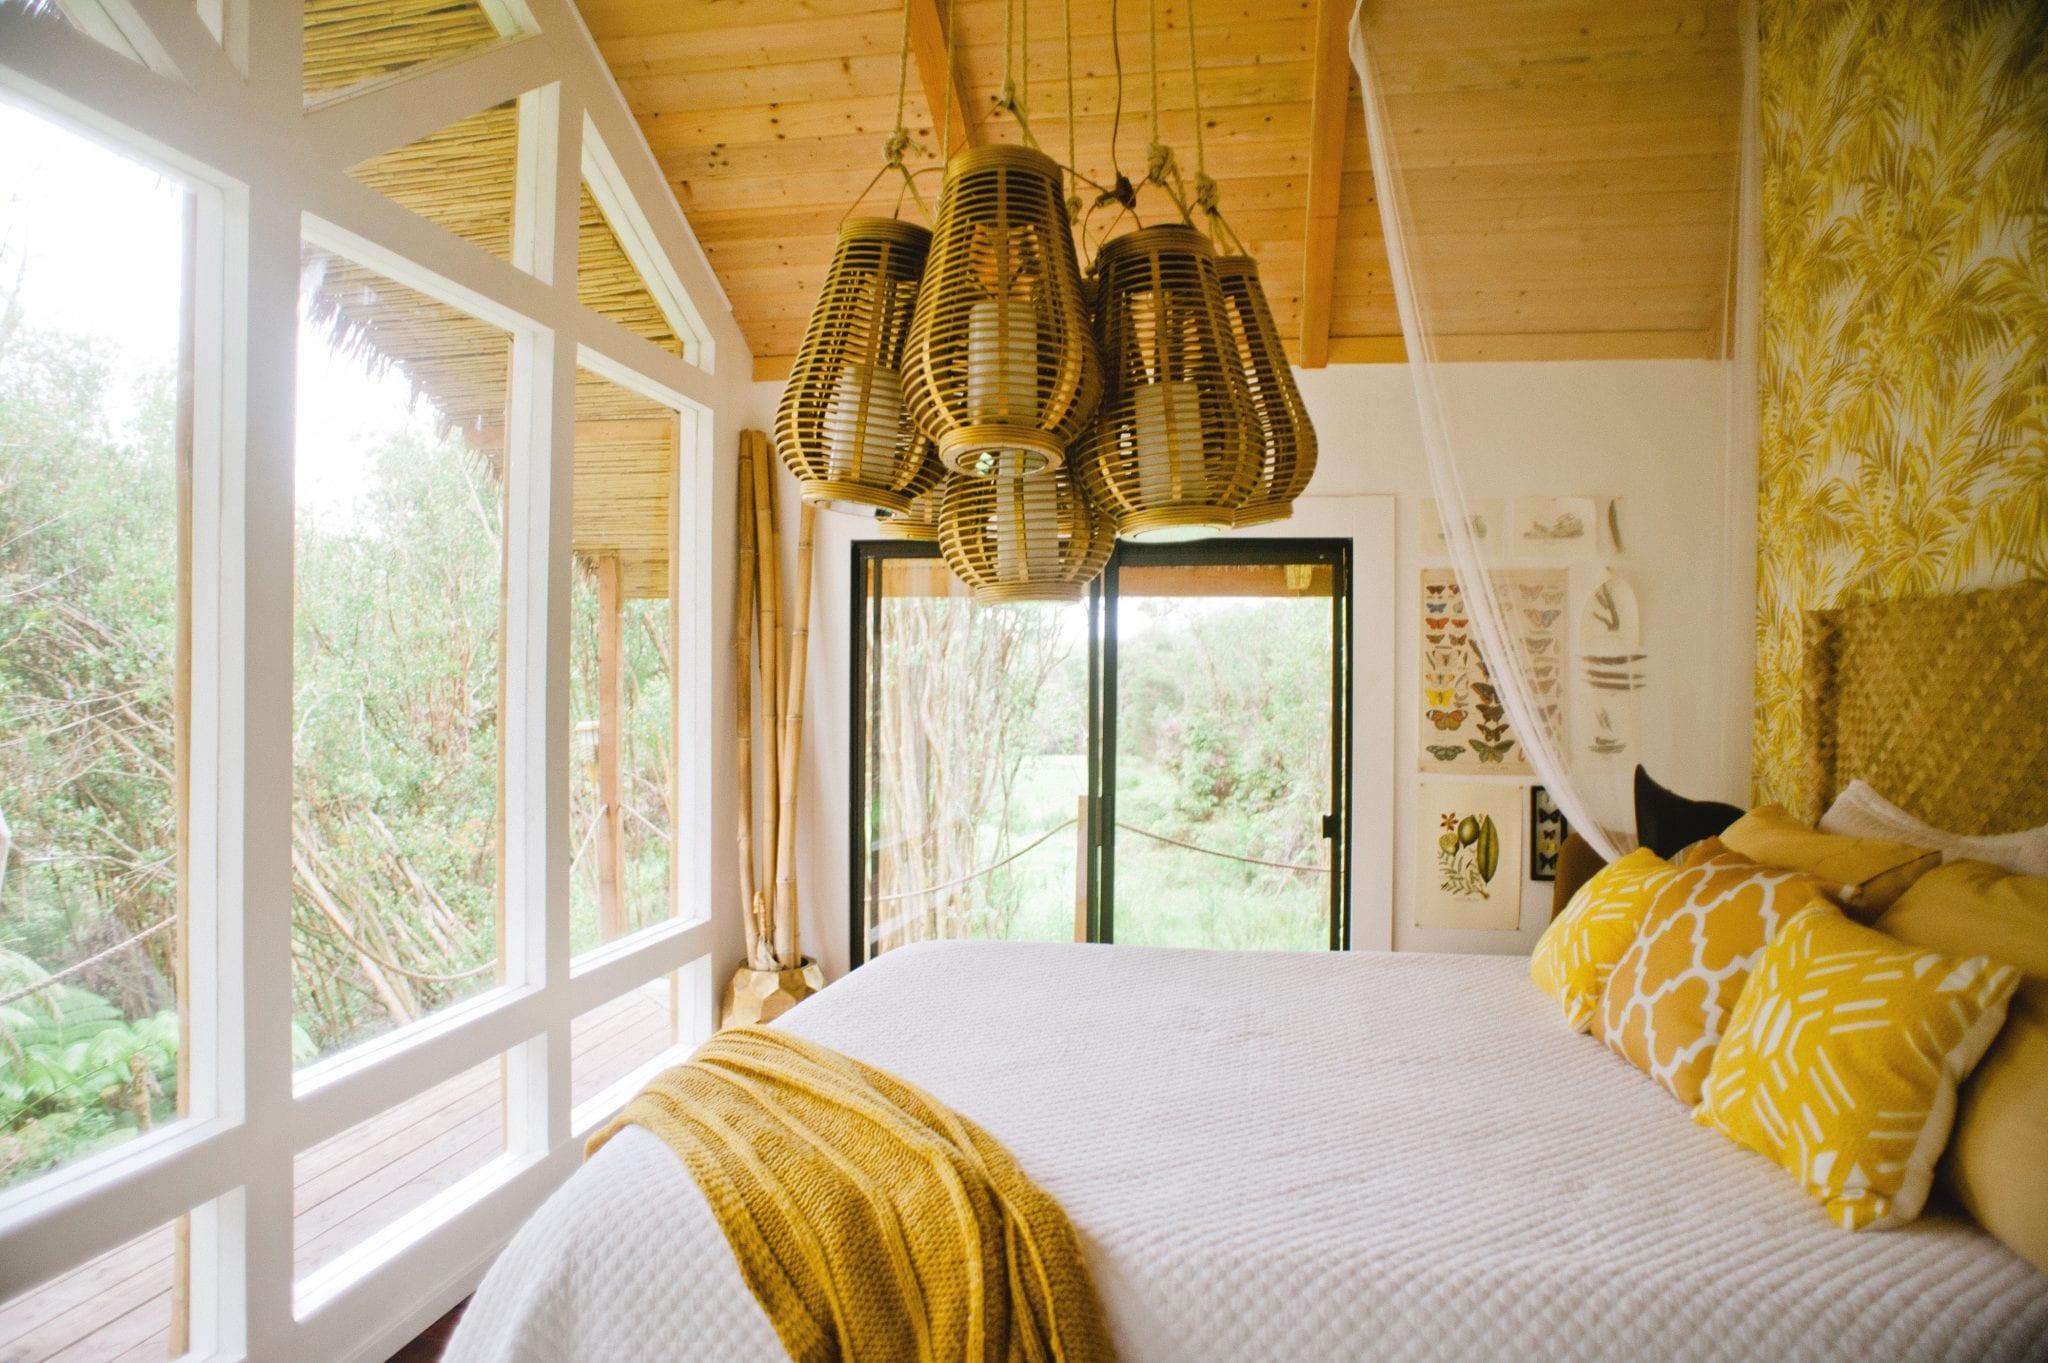 Natuur Airbnb's binnen